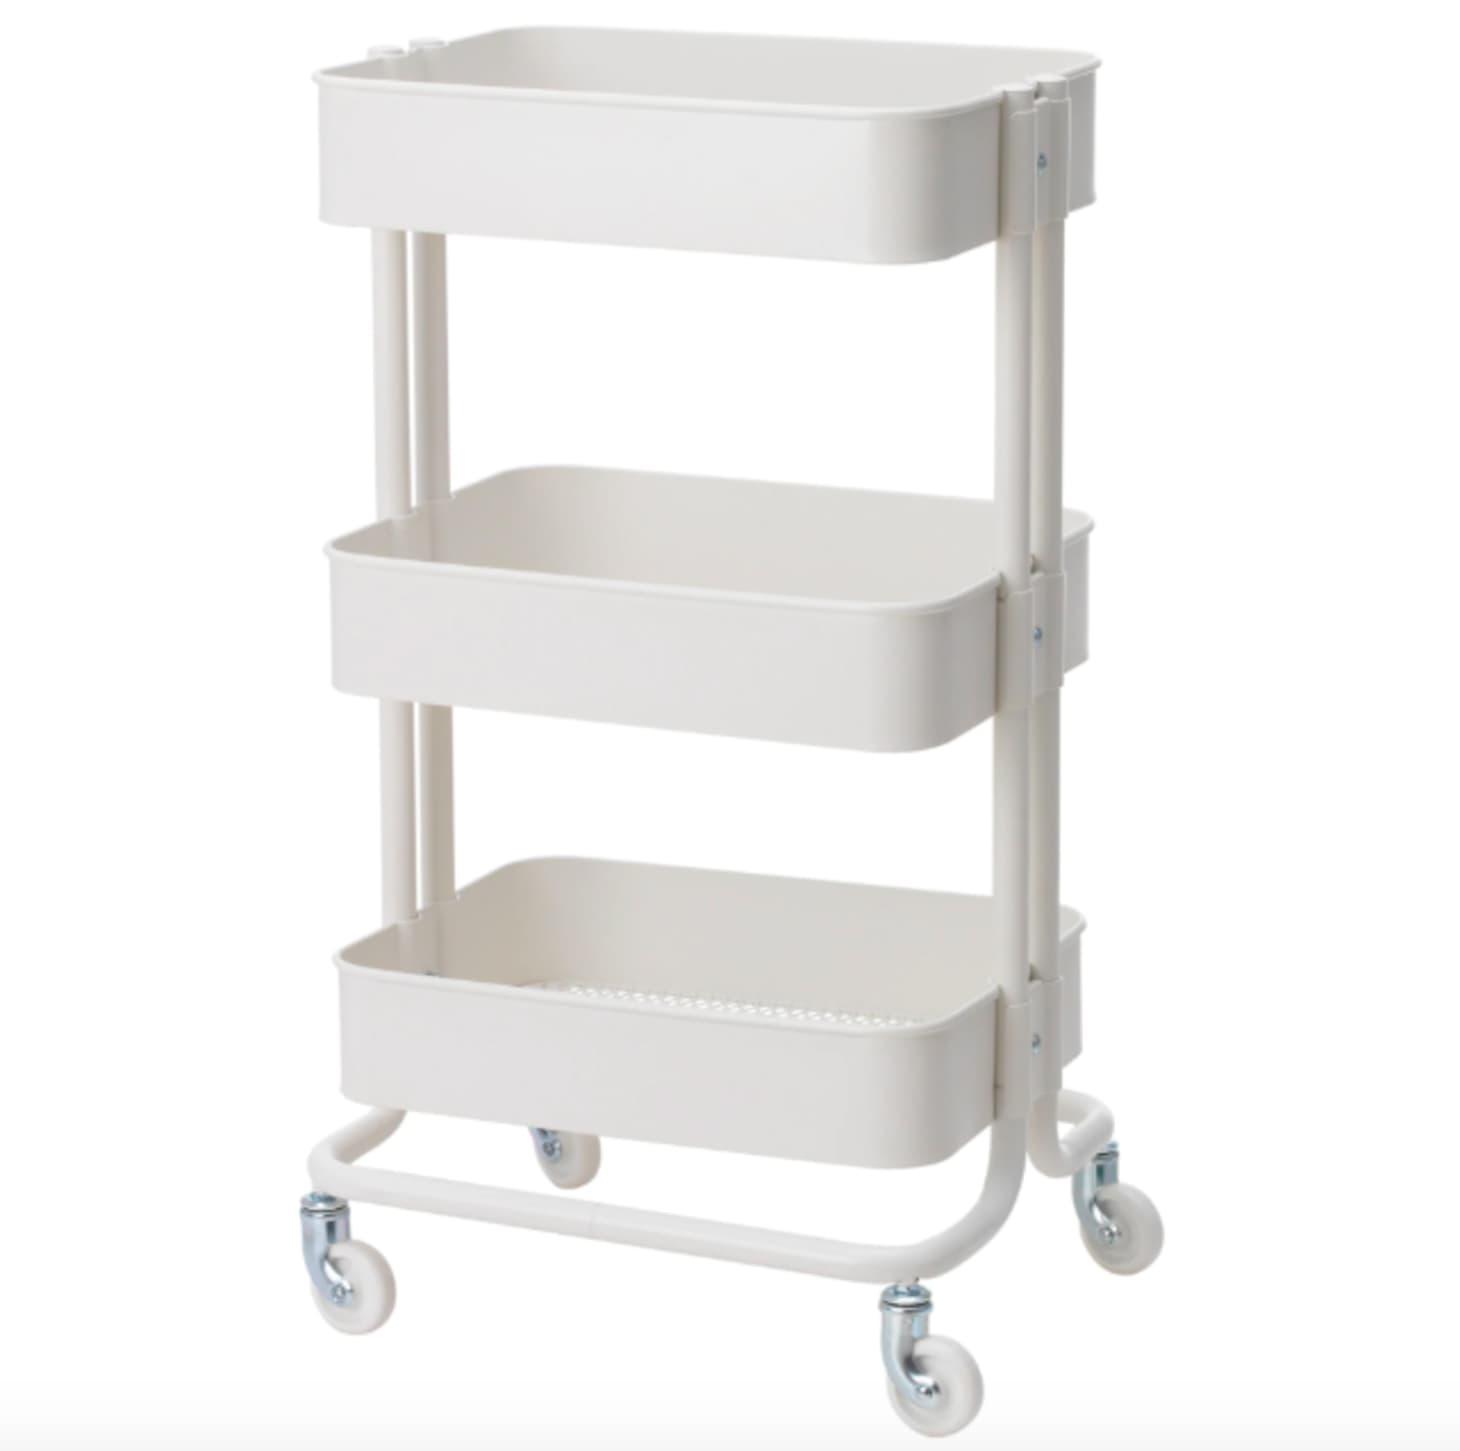 Ikea Raskog Cart Alternatives Aldi Storage Kitchn